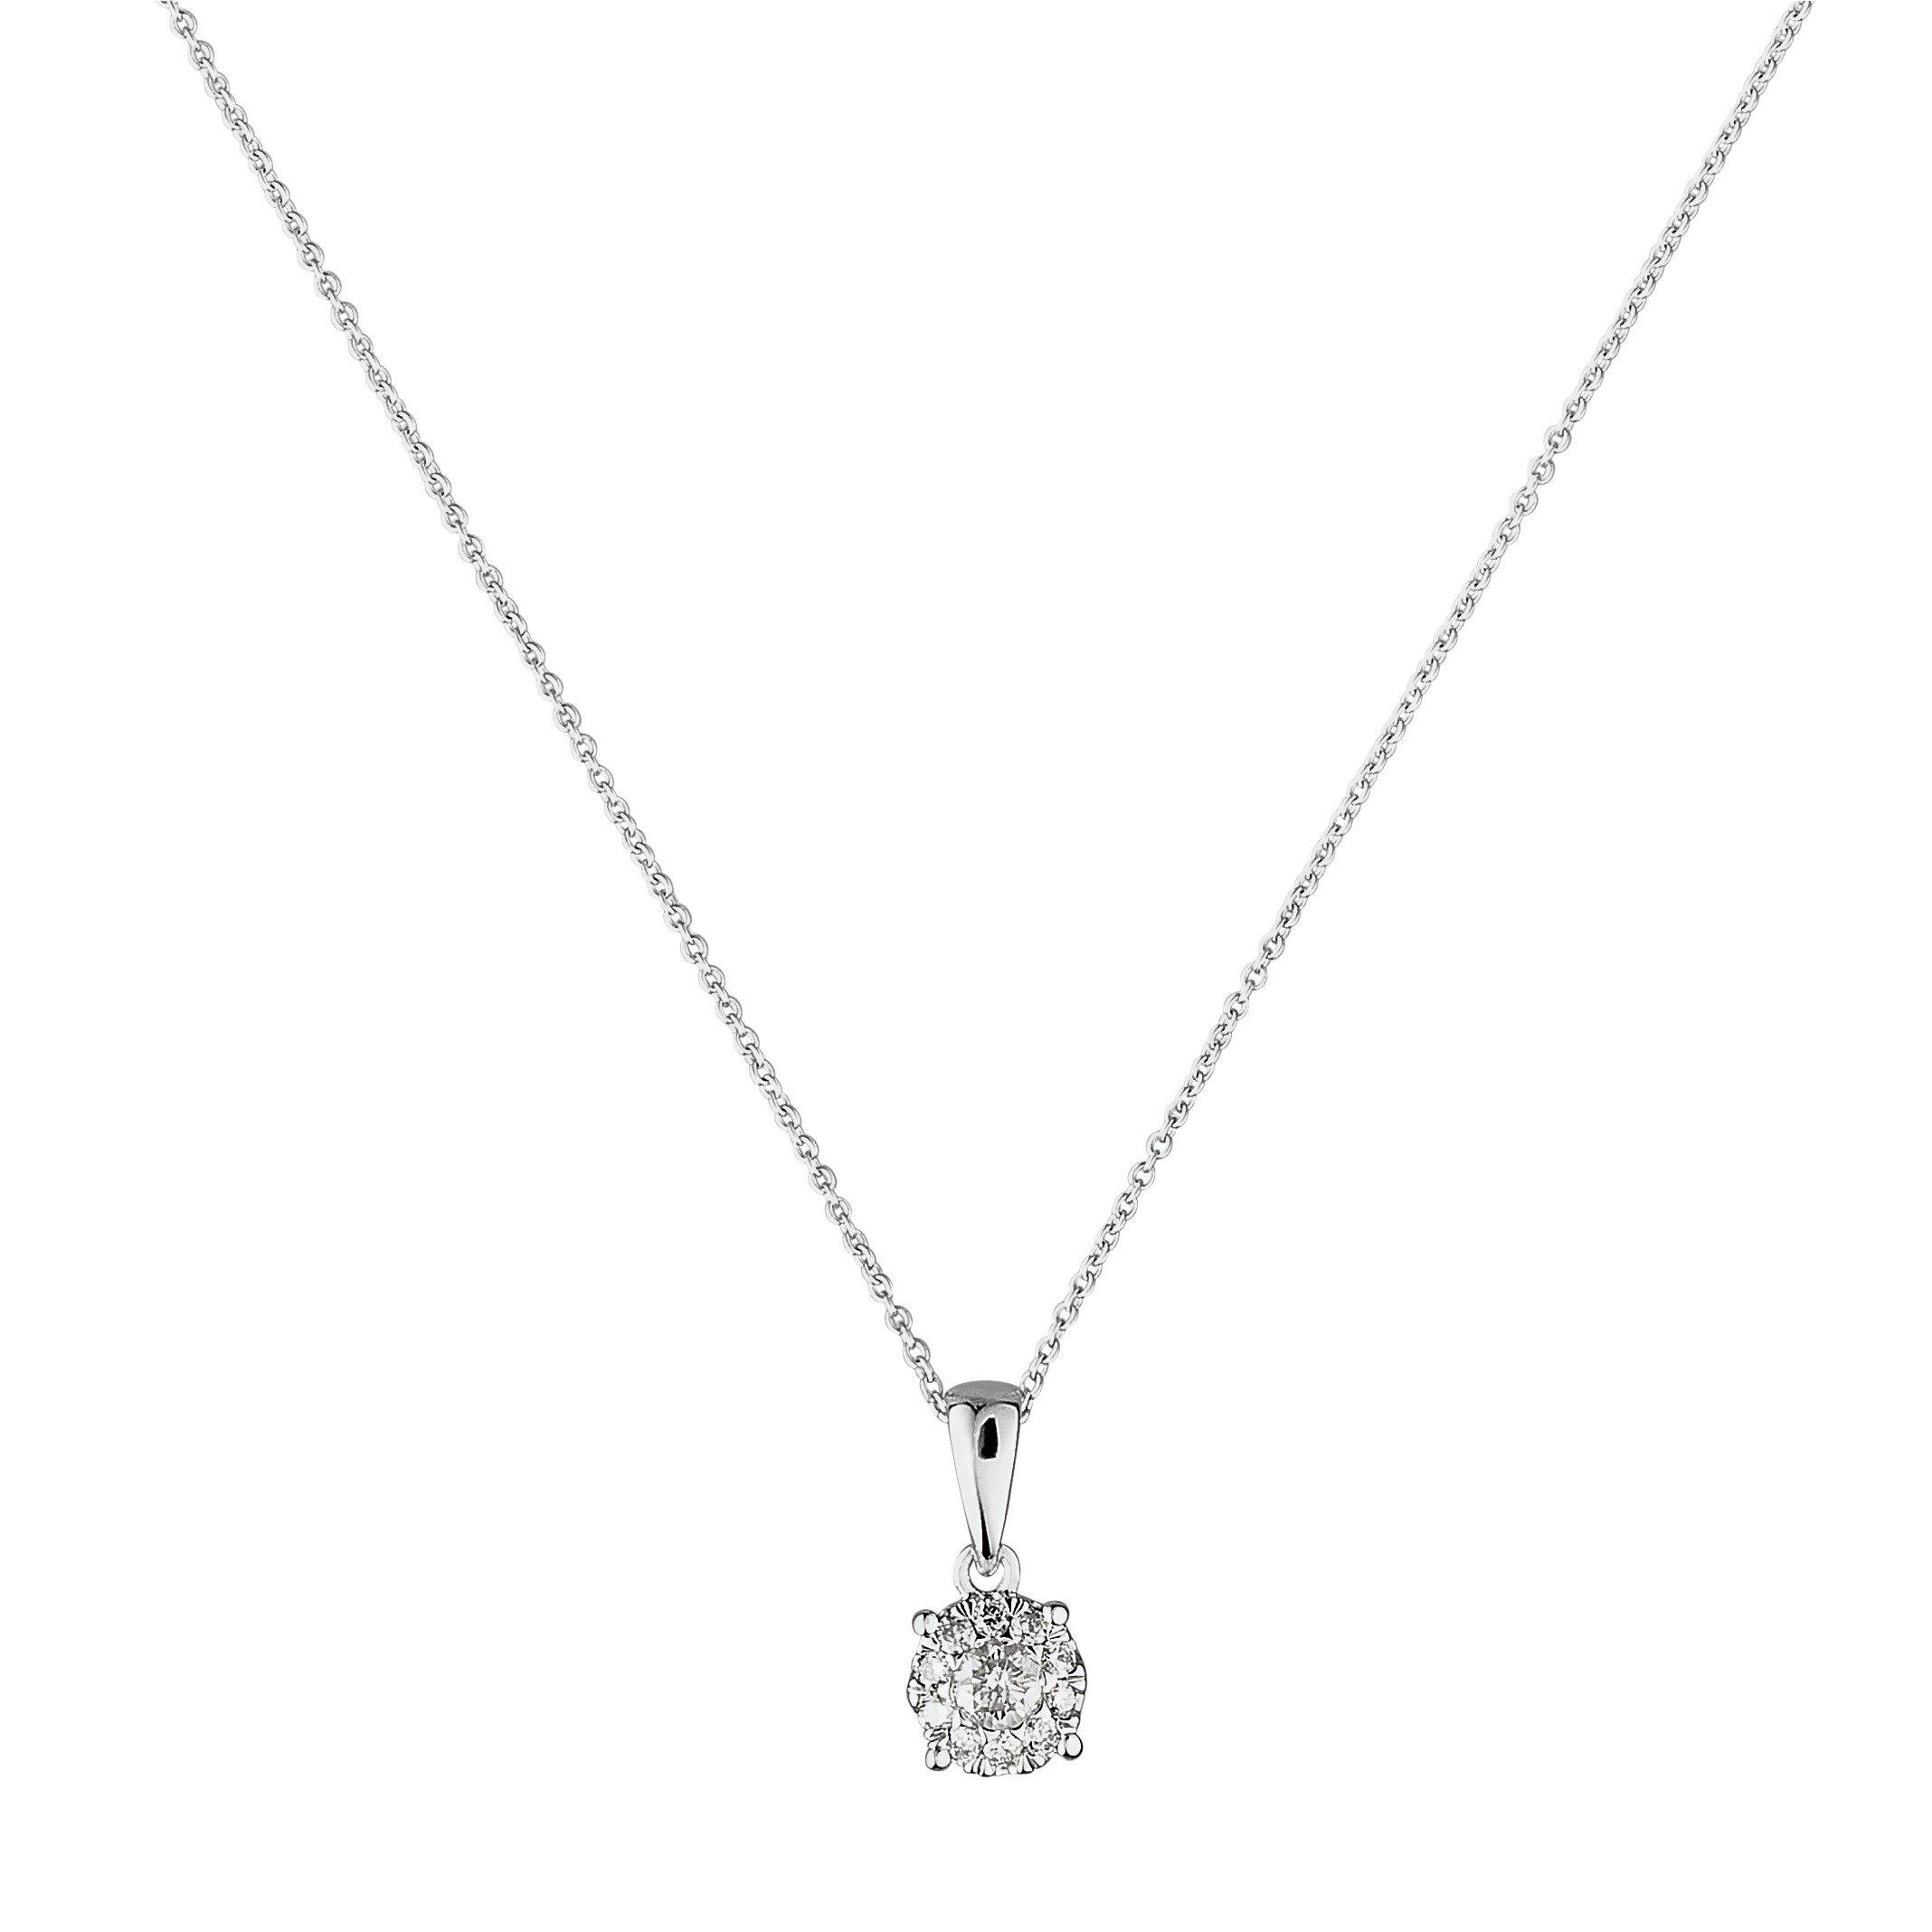 Revere 9ct White Gold 0.25ct tw Diamond Pendant Necklace